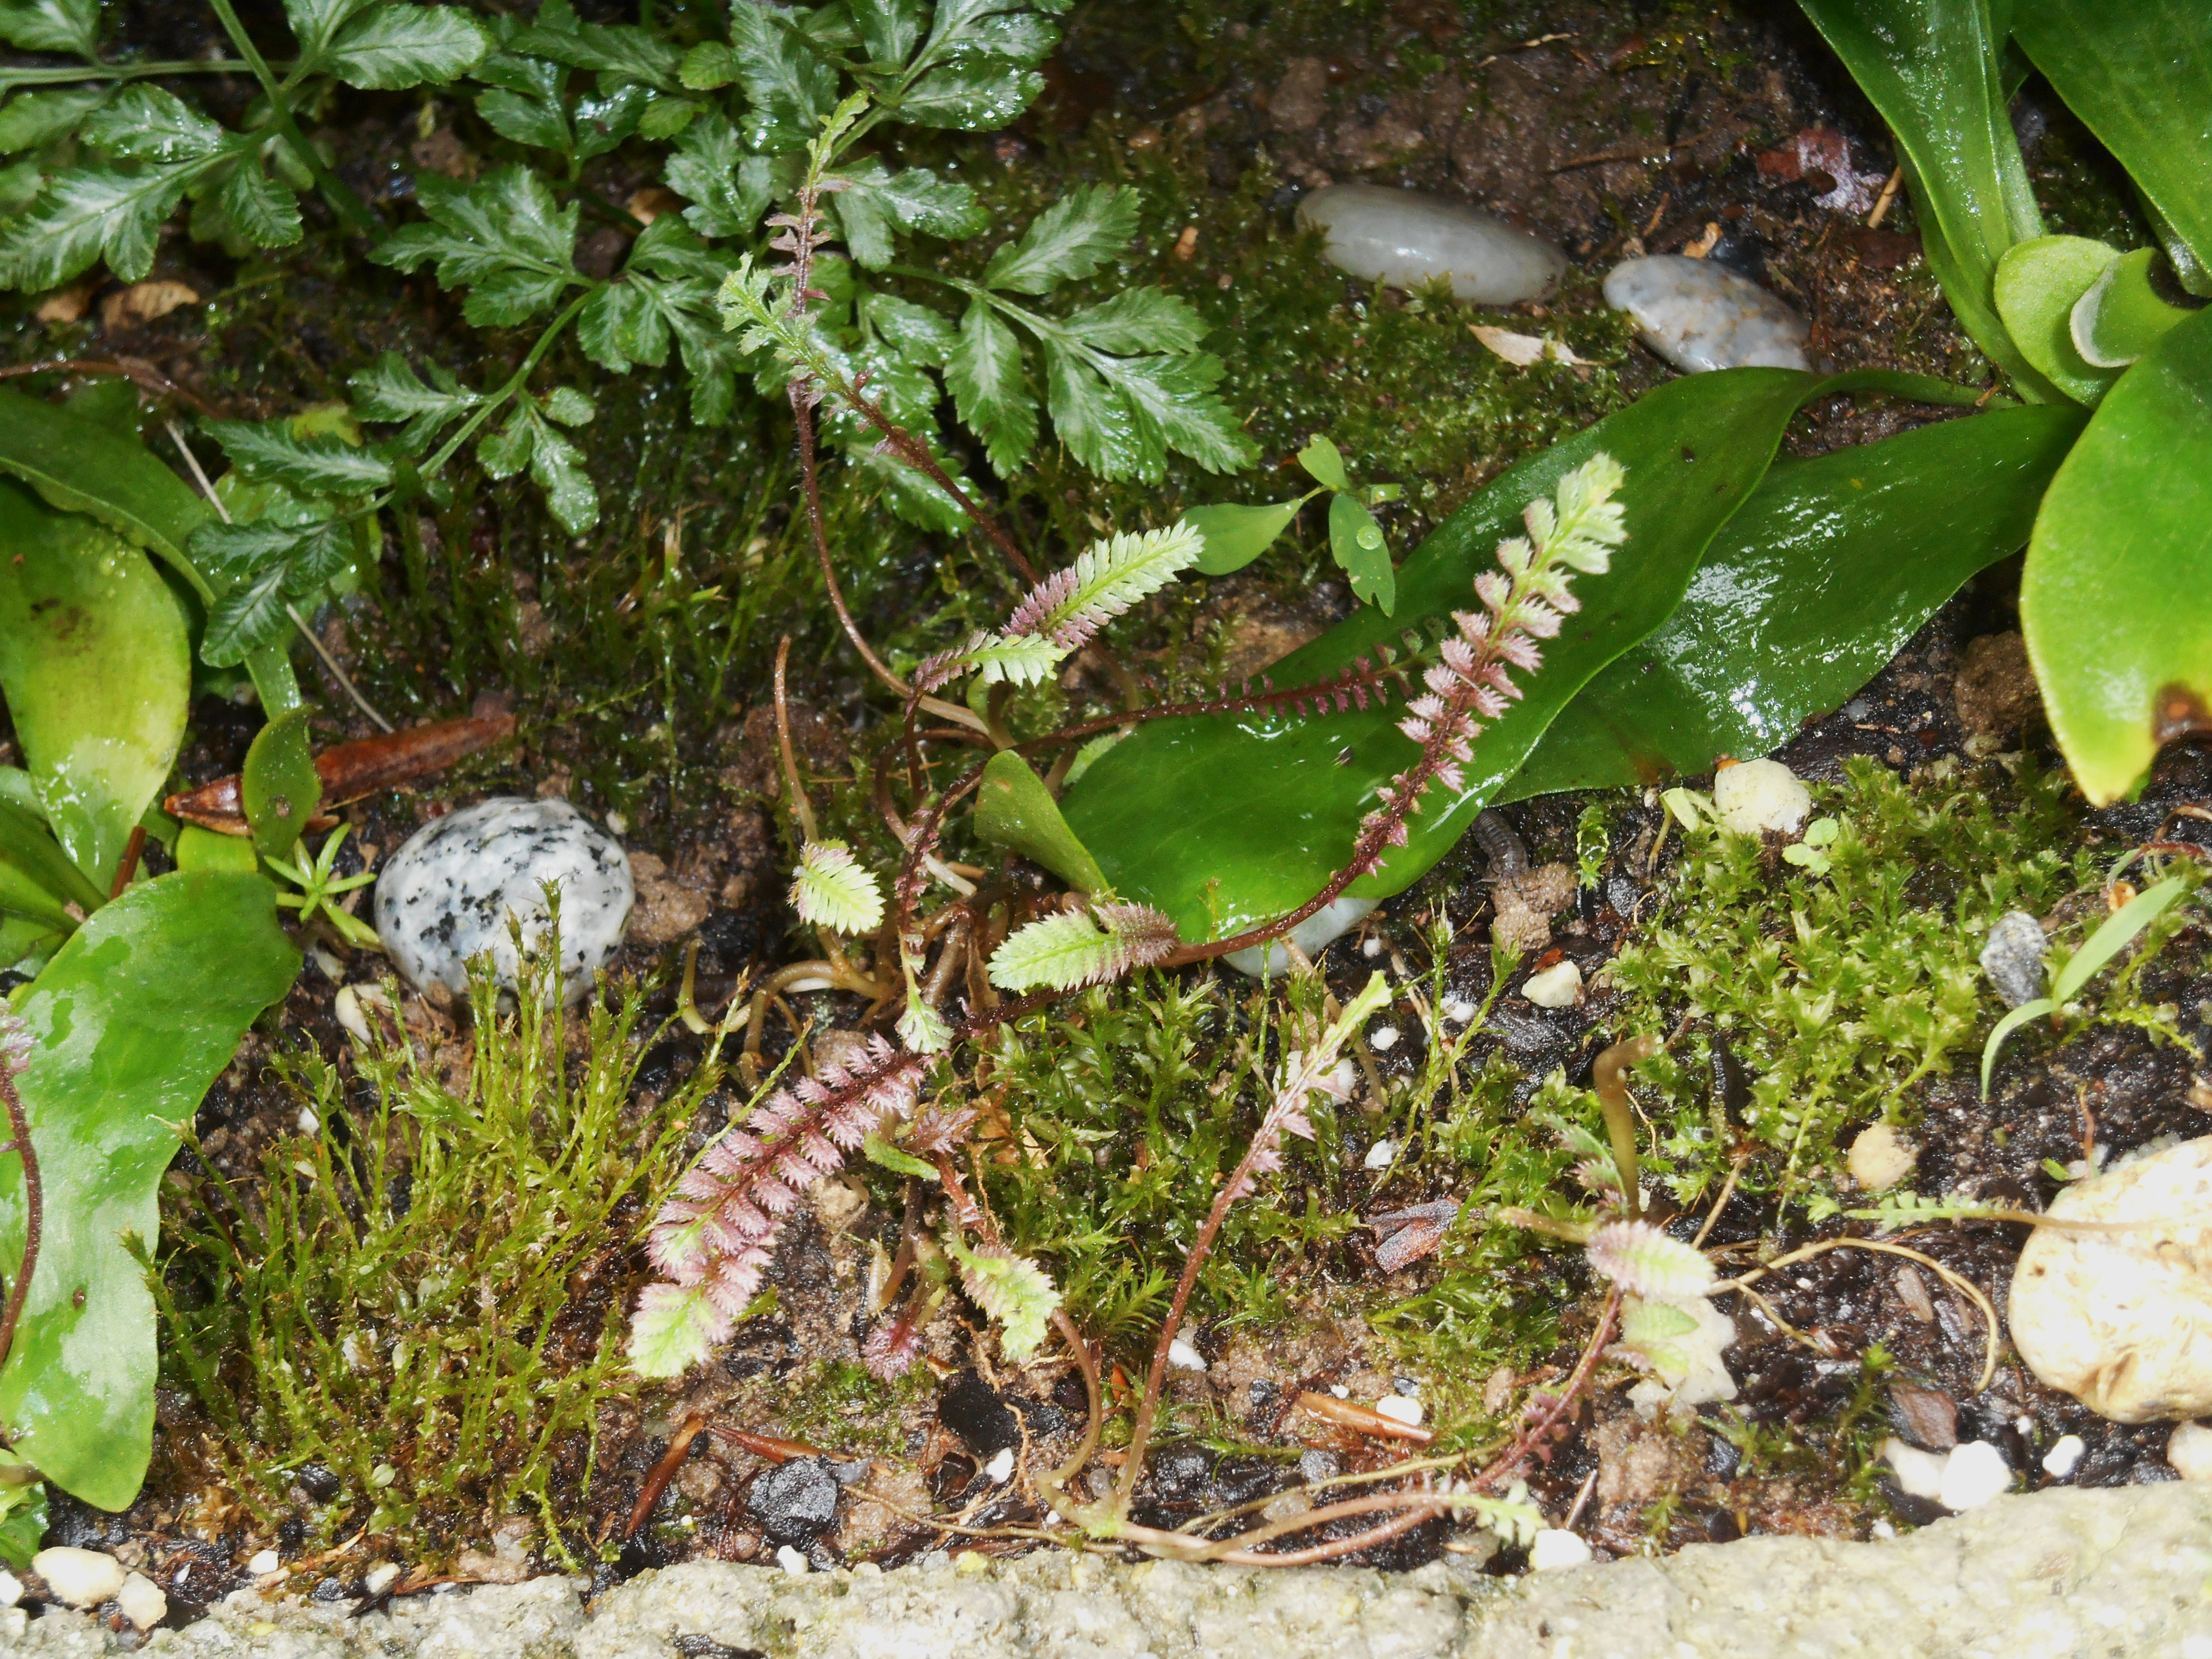 May 23, 2016 fern garden 005